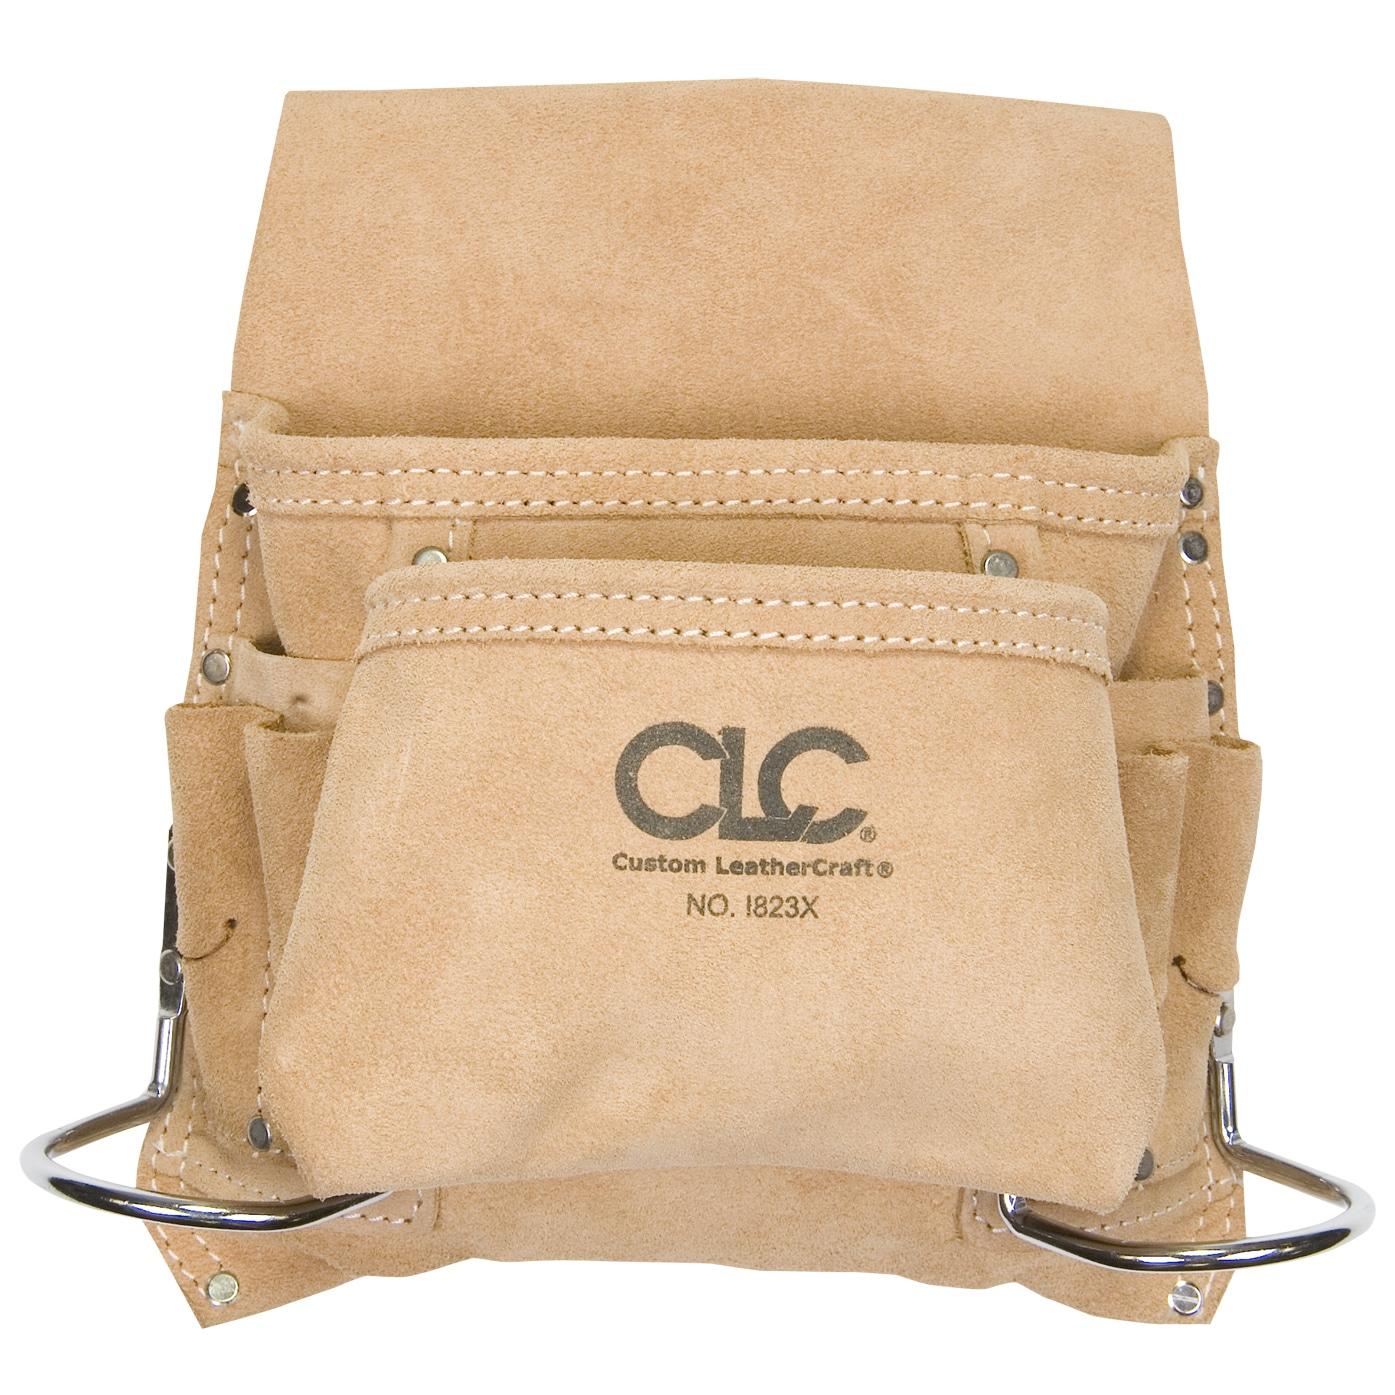 CLC Work Gear I823X 8 Pocket Carpenter's Nail & Tool Bag ...